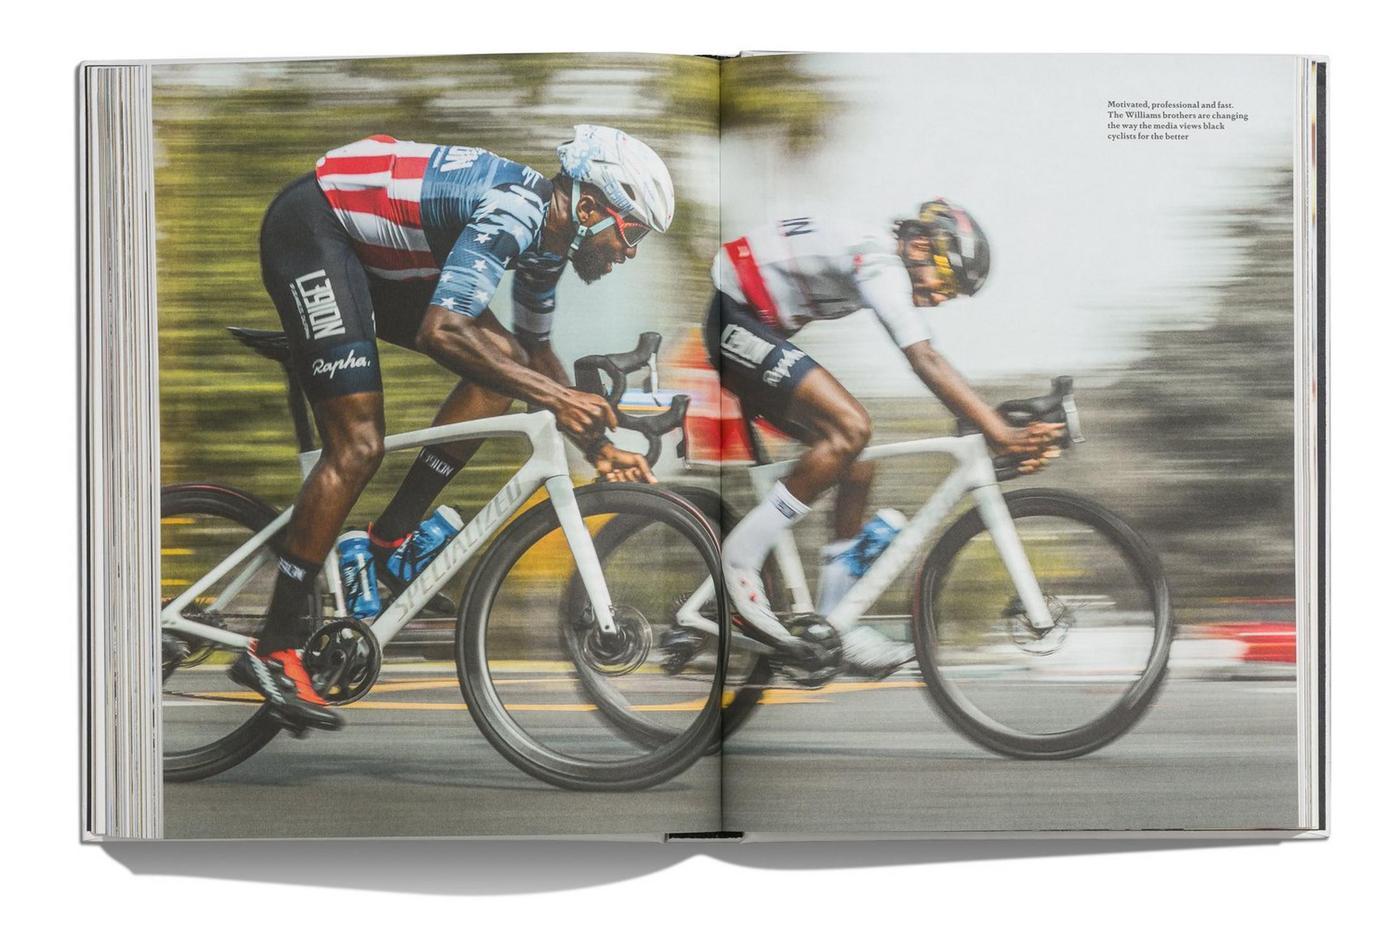 Rapha: Desire Discrimination Determination – Black Champions in Cycling